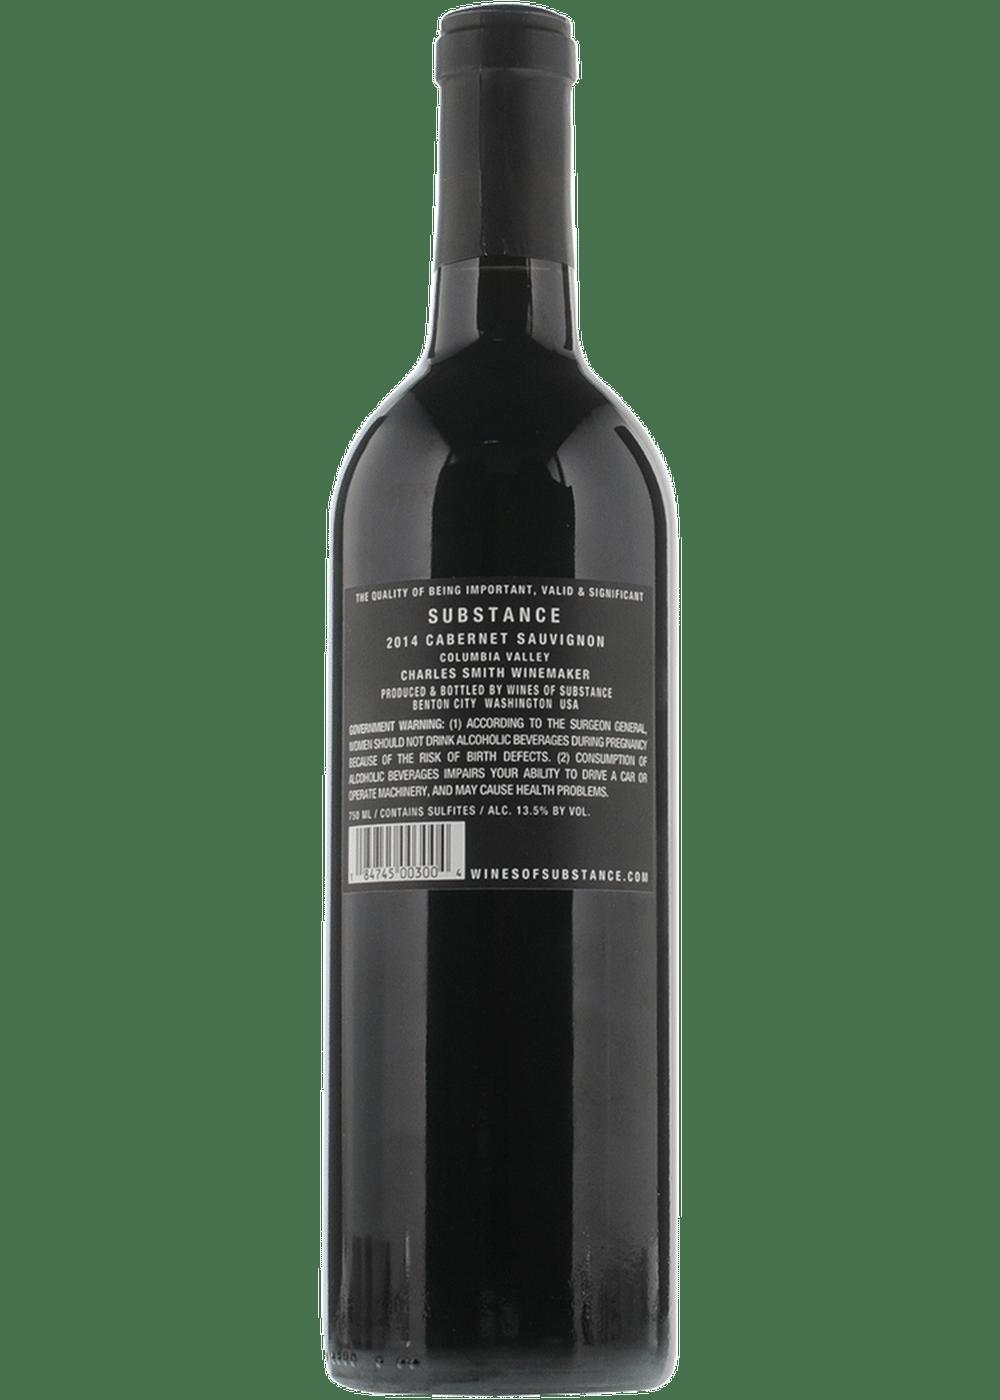 2019 Charles Smith Substance Cabernet Sauvignon 750ml